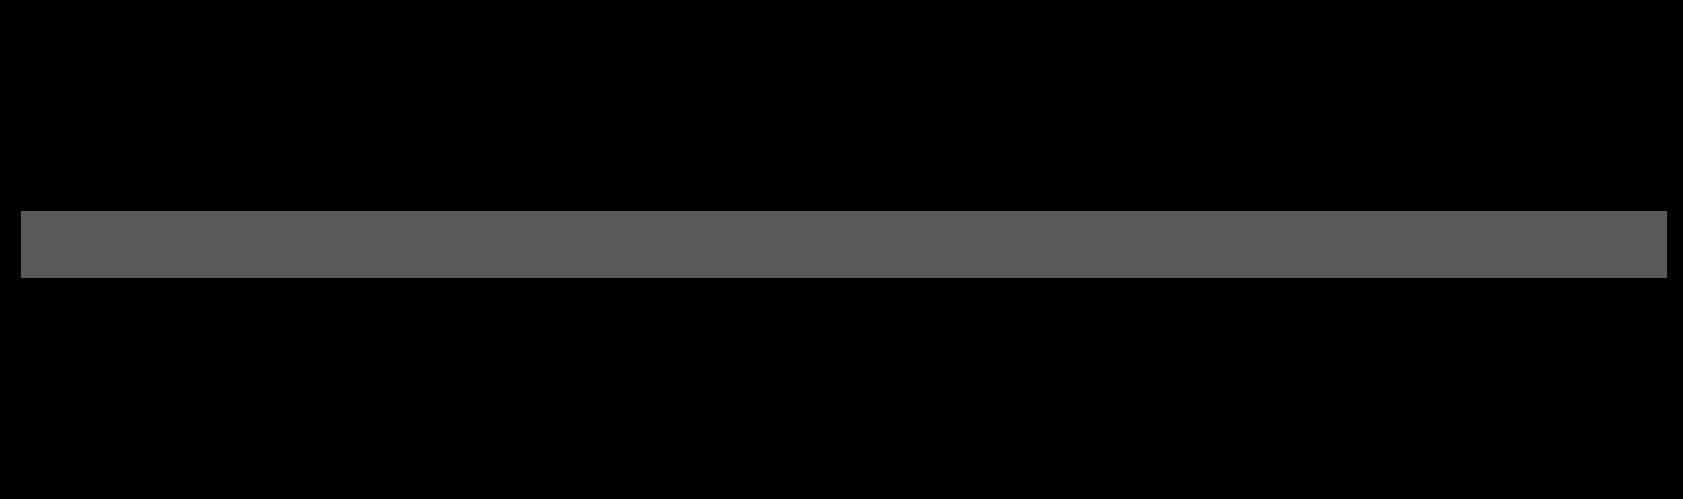 Fast Auto Parts customer logo Partly